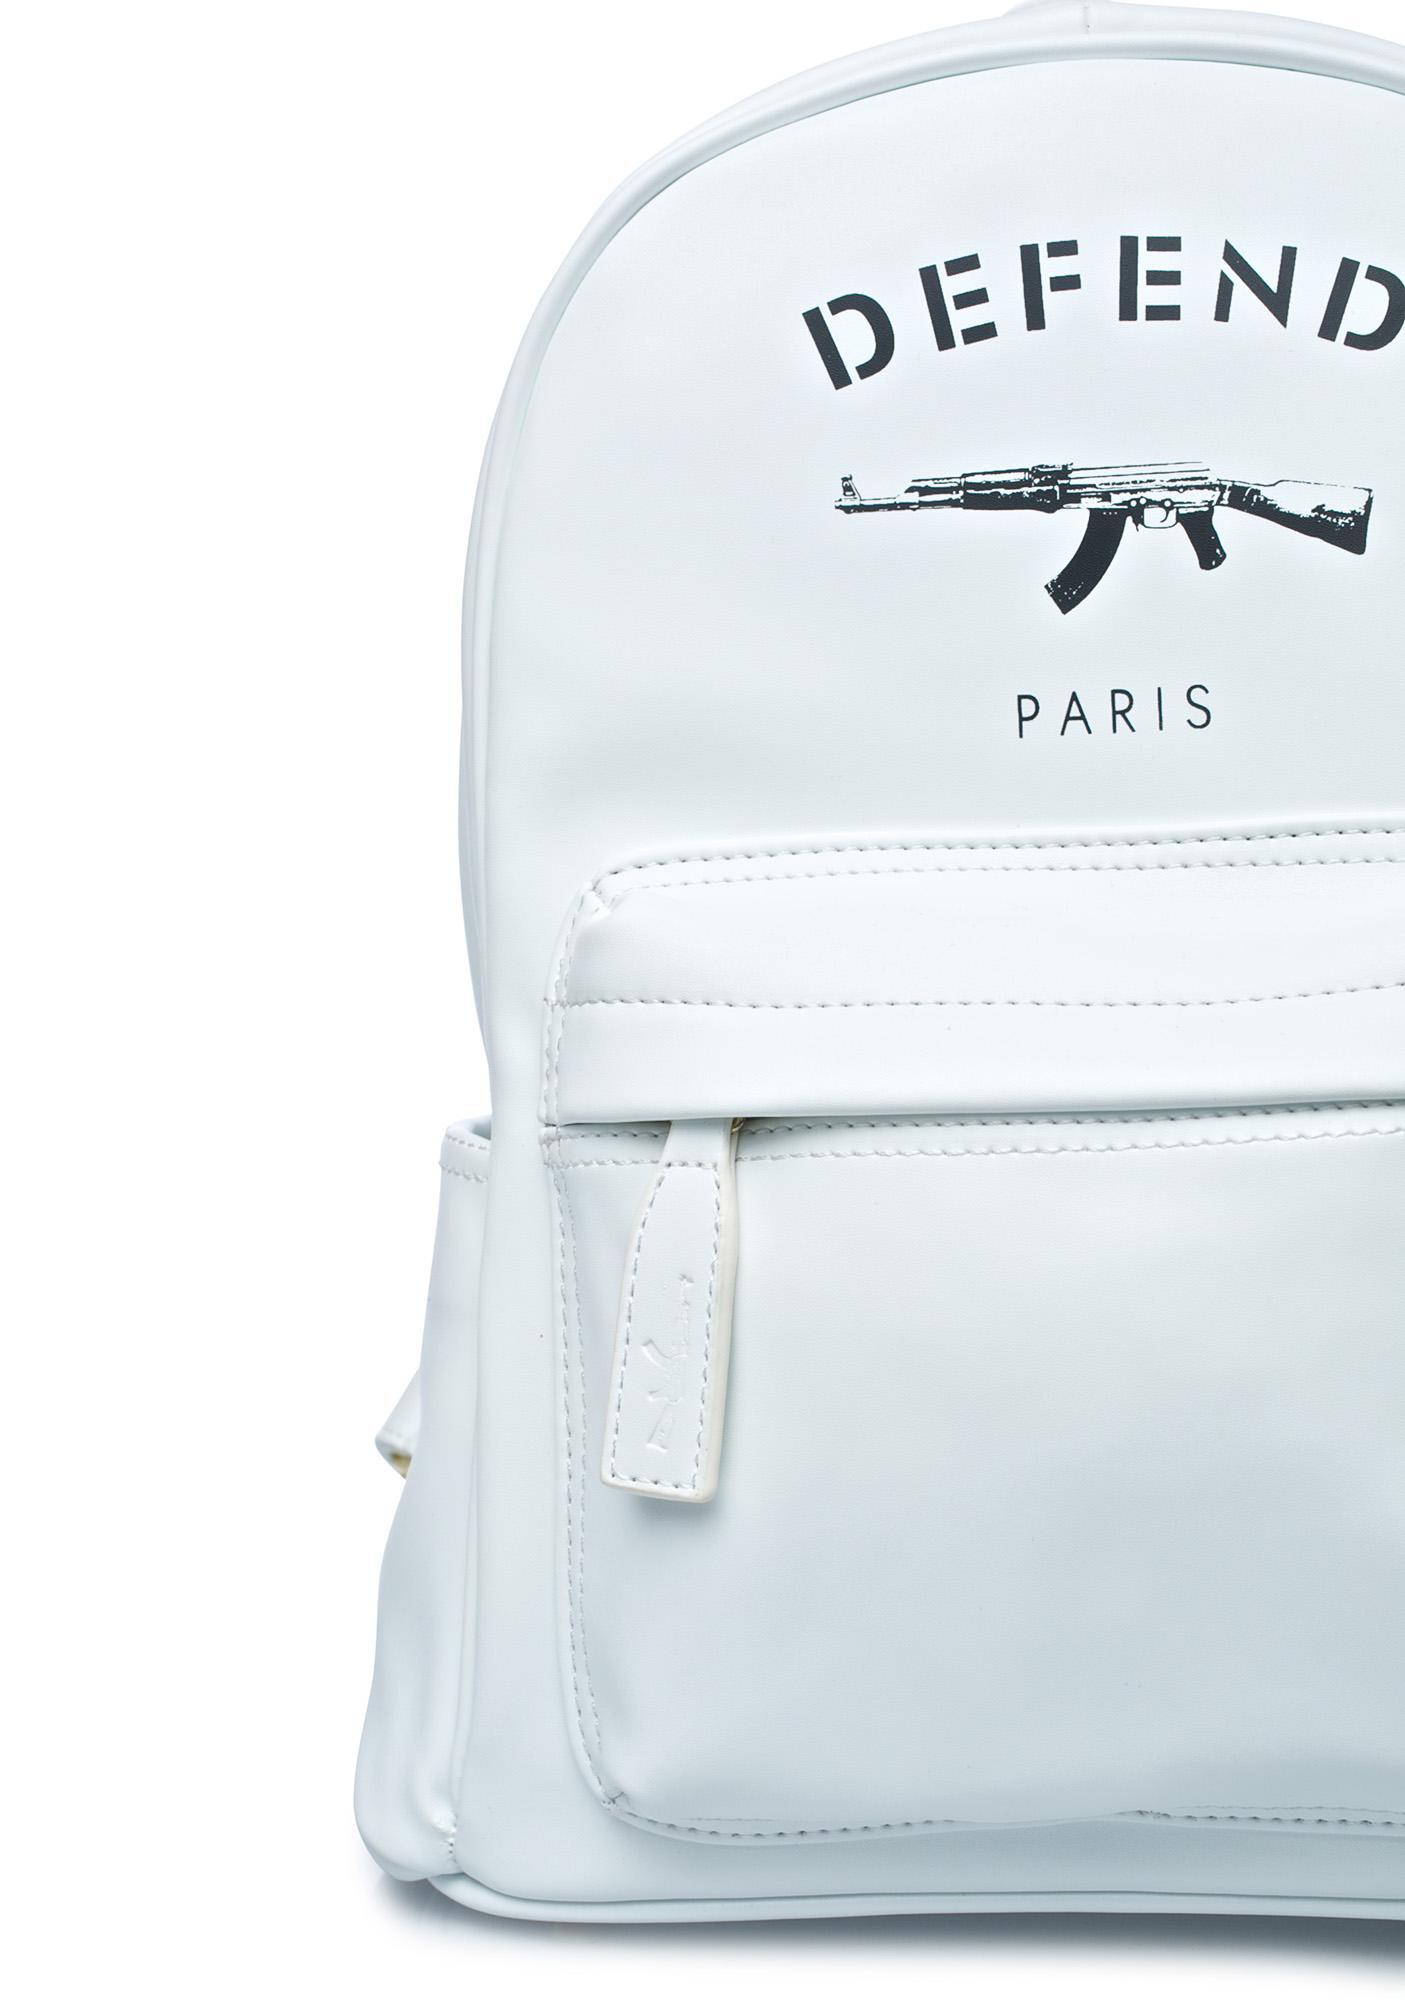 Defend Paris White AK Backpack